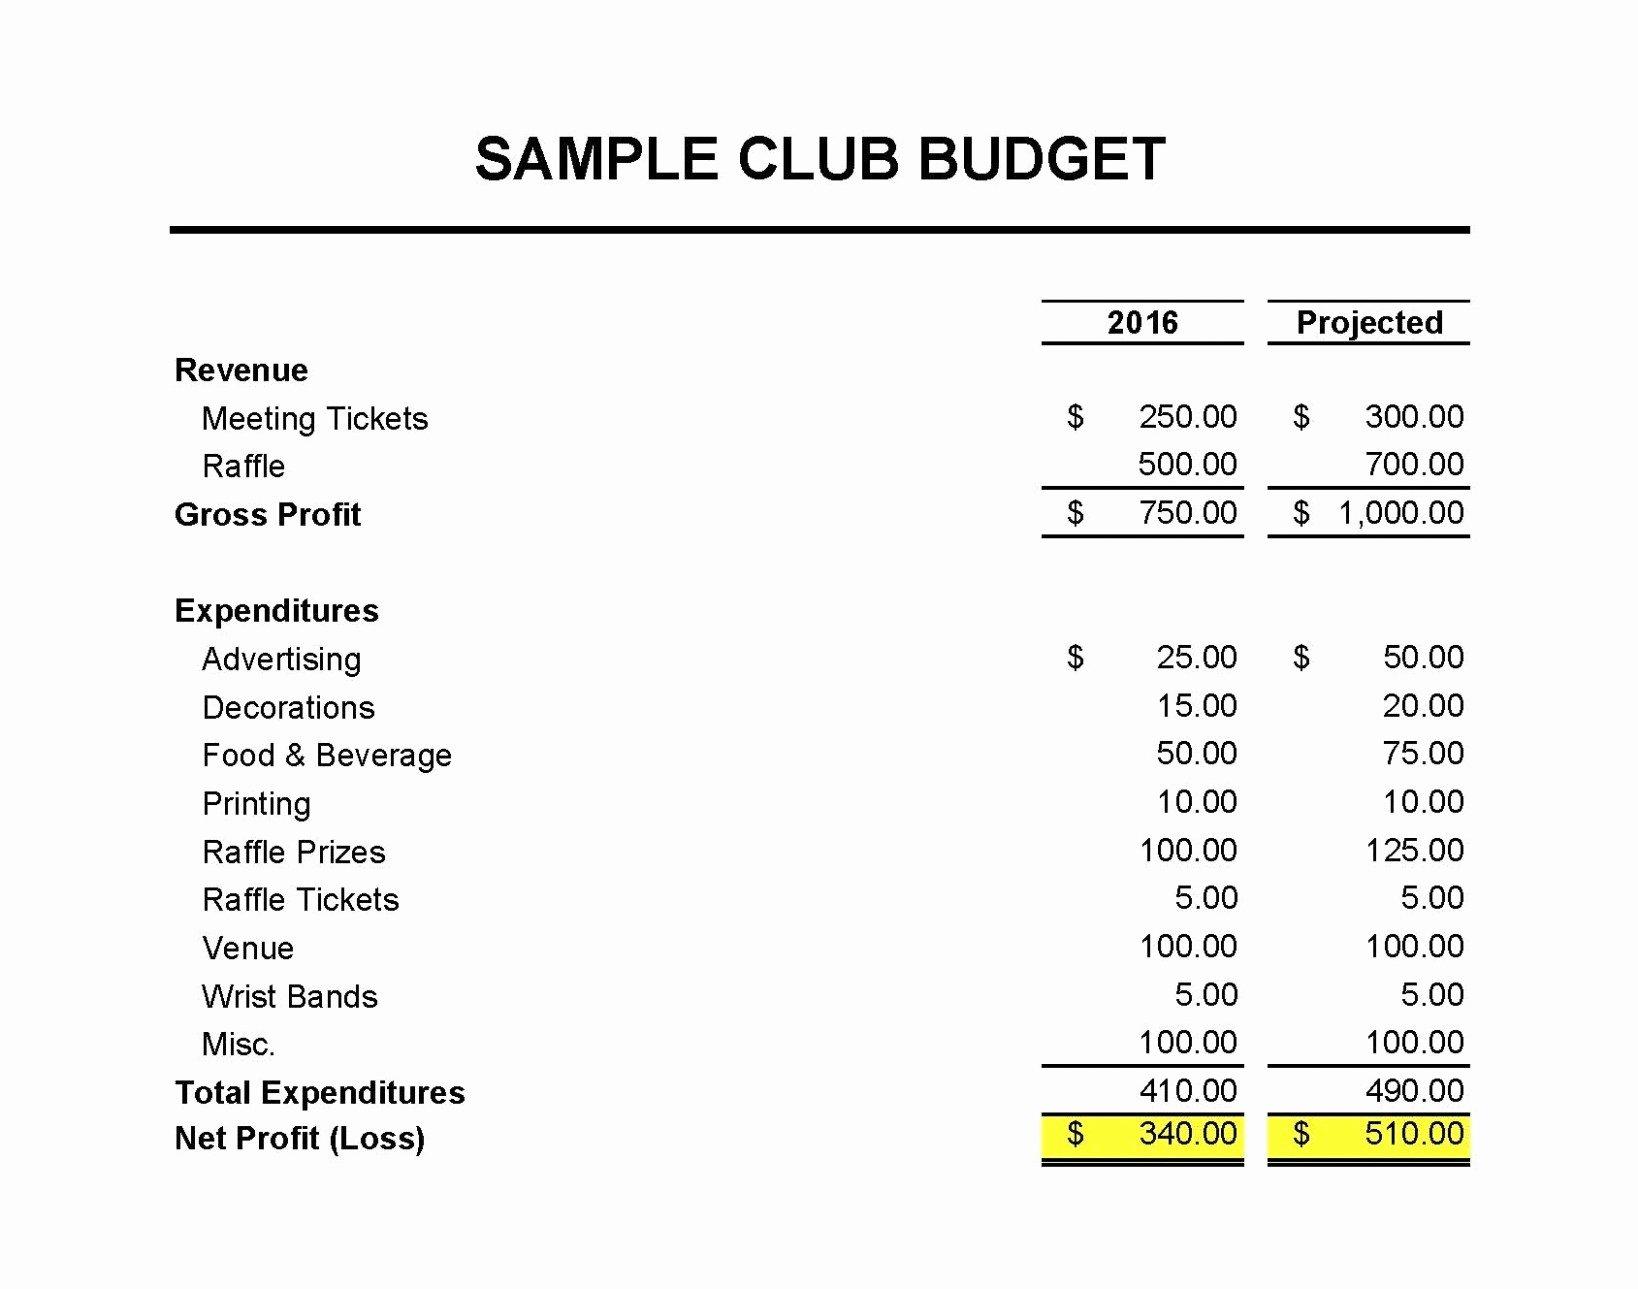 Treasurer Report Template Non Profit Inspirational Pto Treasurer Non Profit All Treasurers Report Template